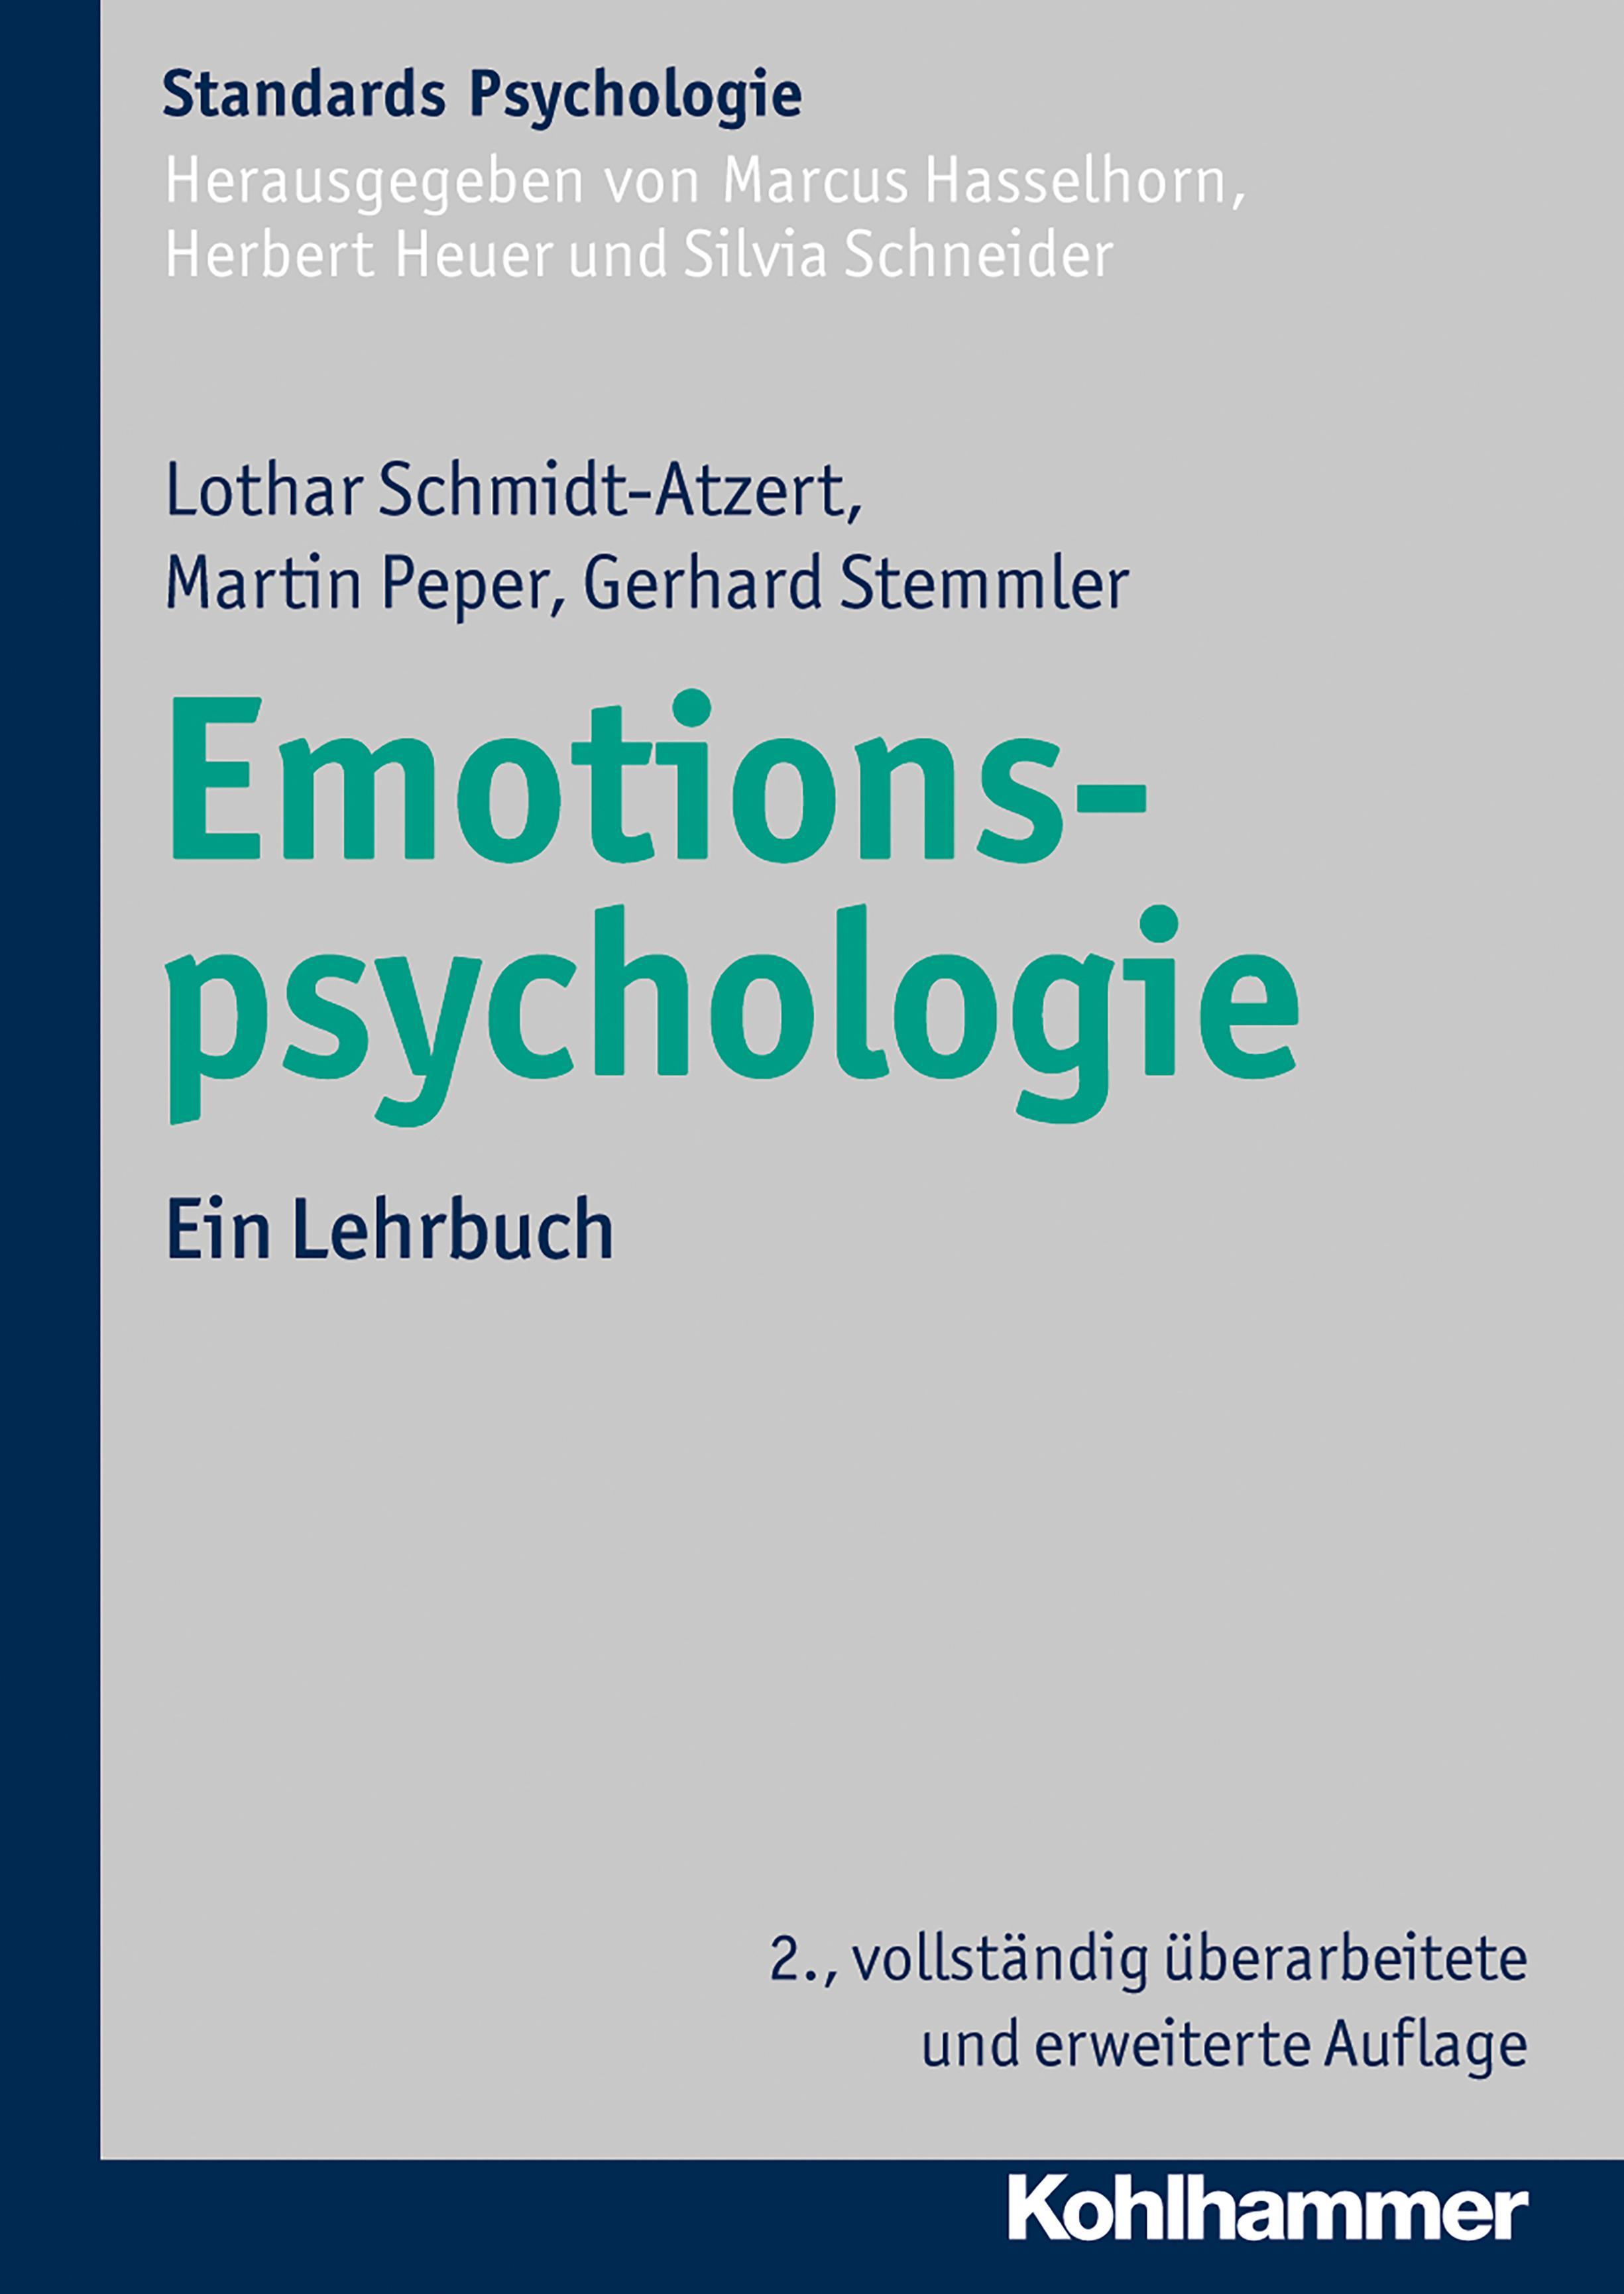 NEU Emotionspsychologie Gerhard Stemmler 205956